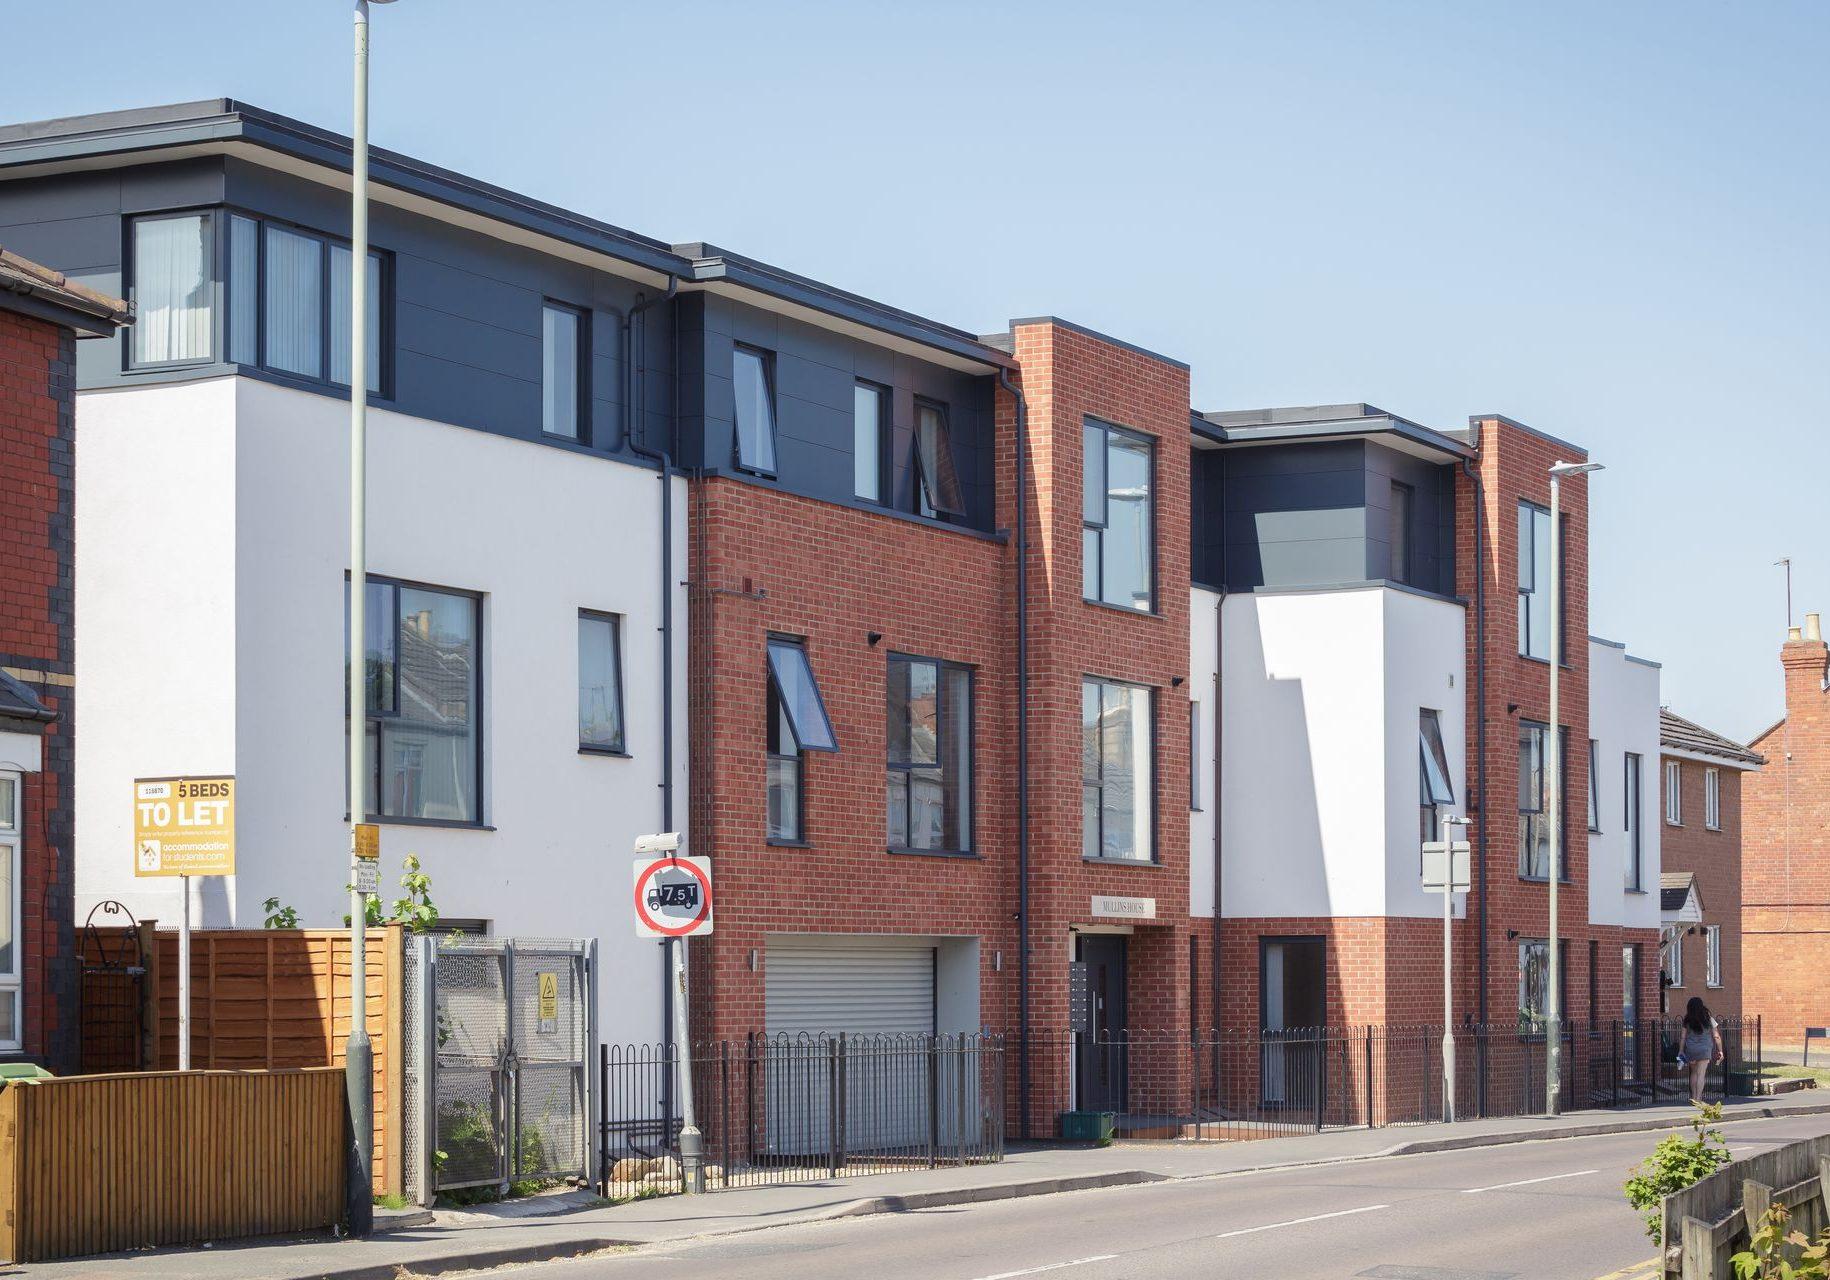 CE - Mullins House Swindon Road 001